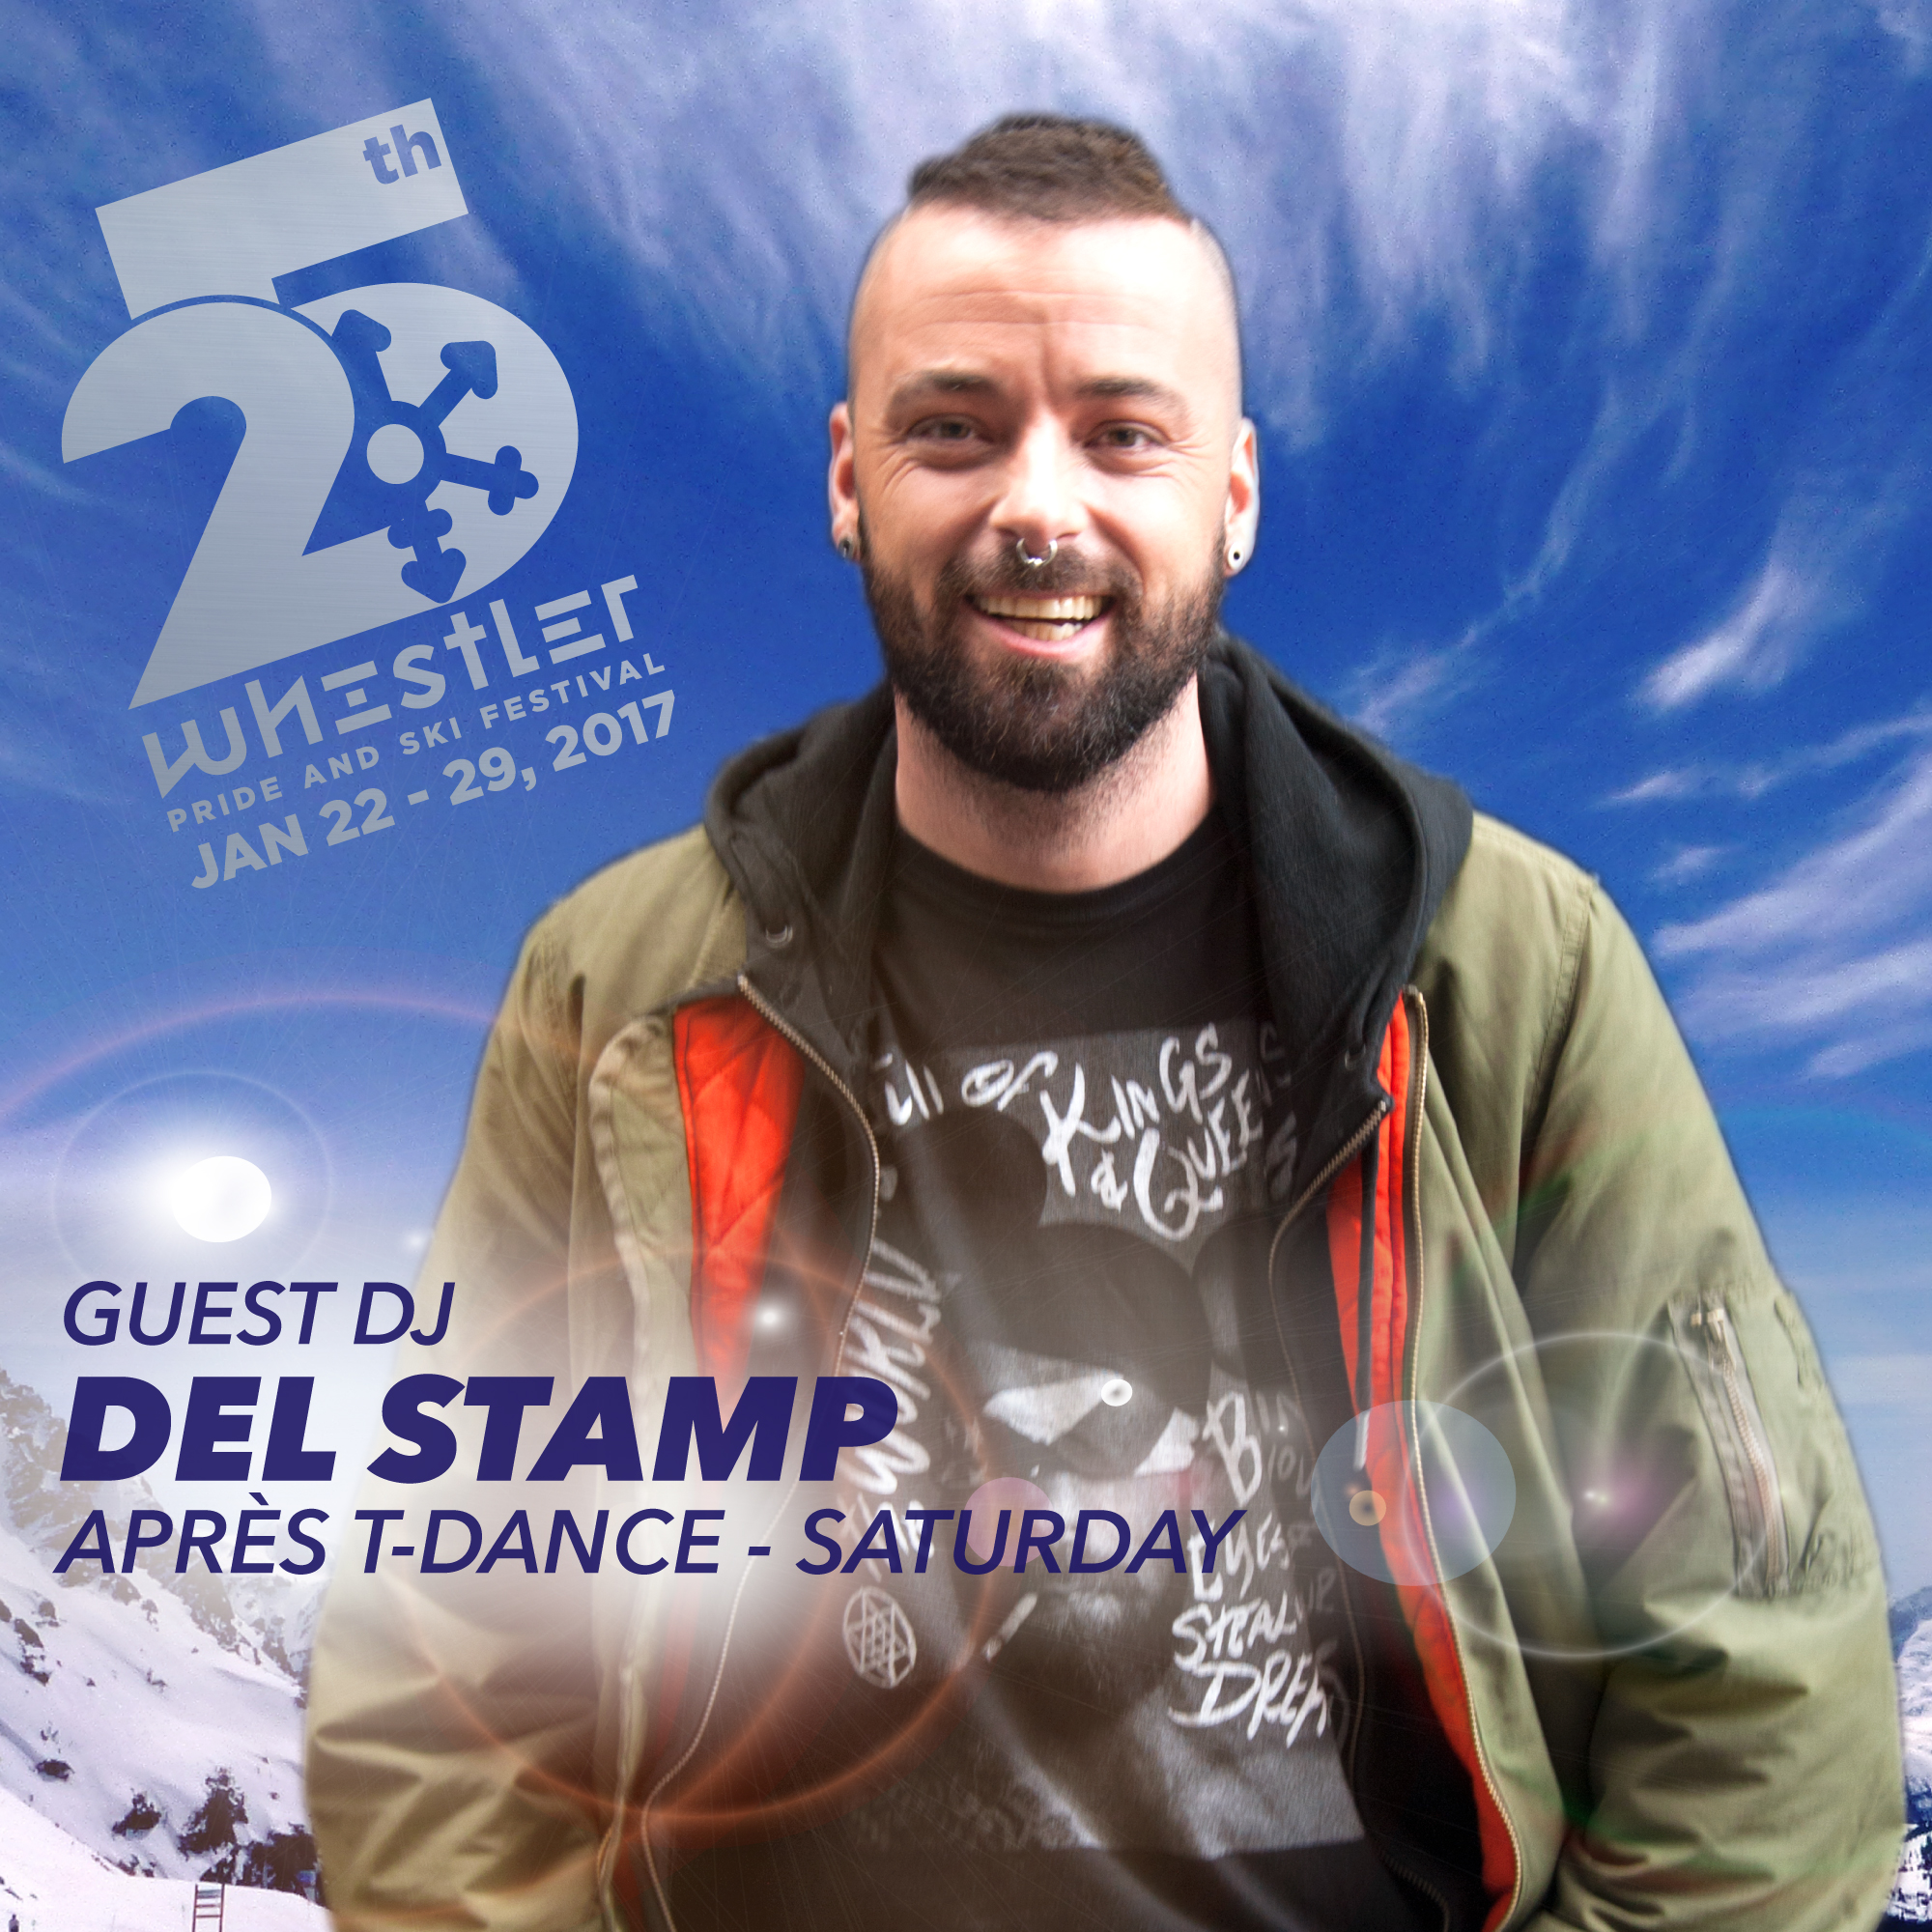 DJ Del Stamp returns to Whistler Pride Après Ski on Sat., Jan. 28th presented by TD Bank Group